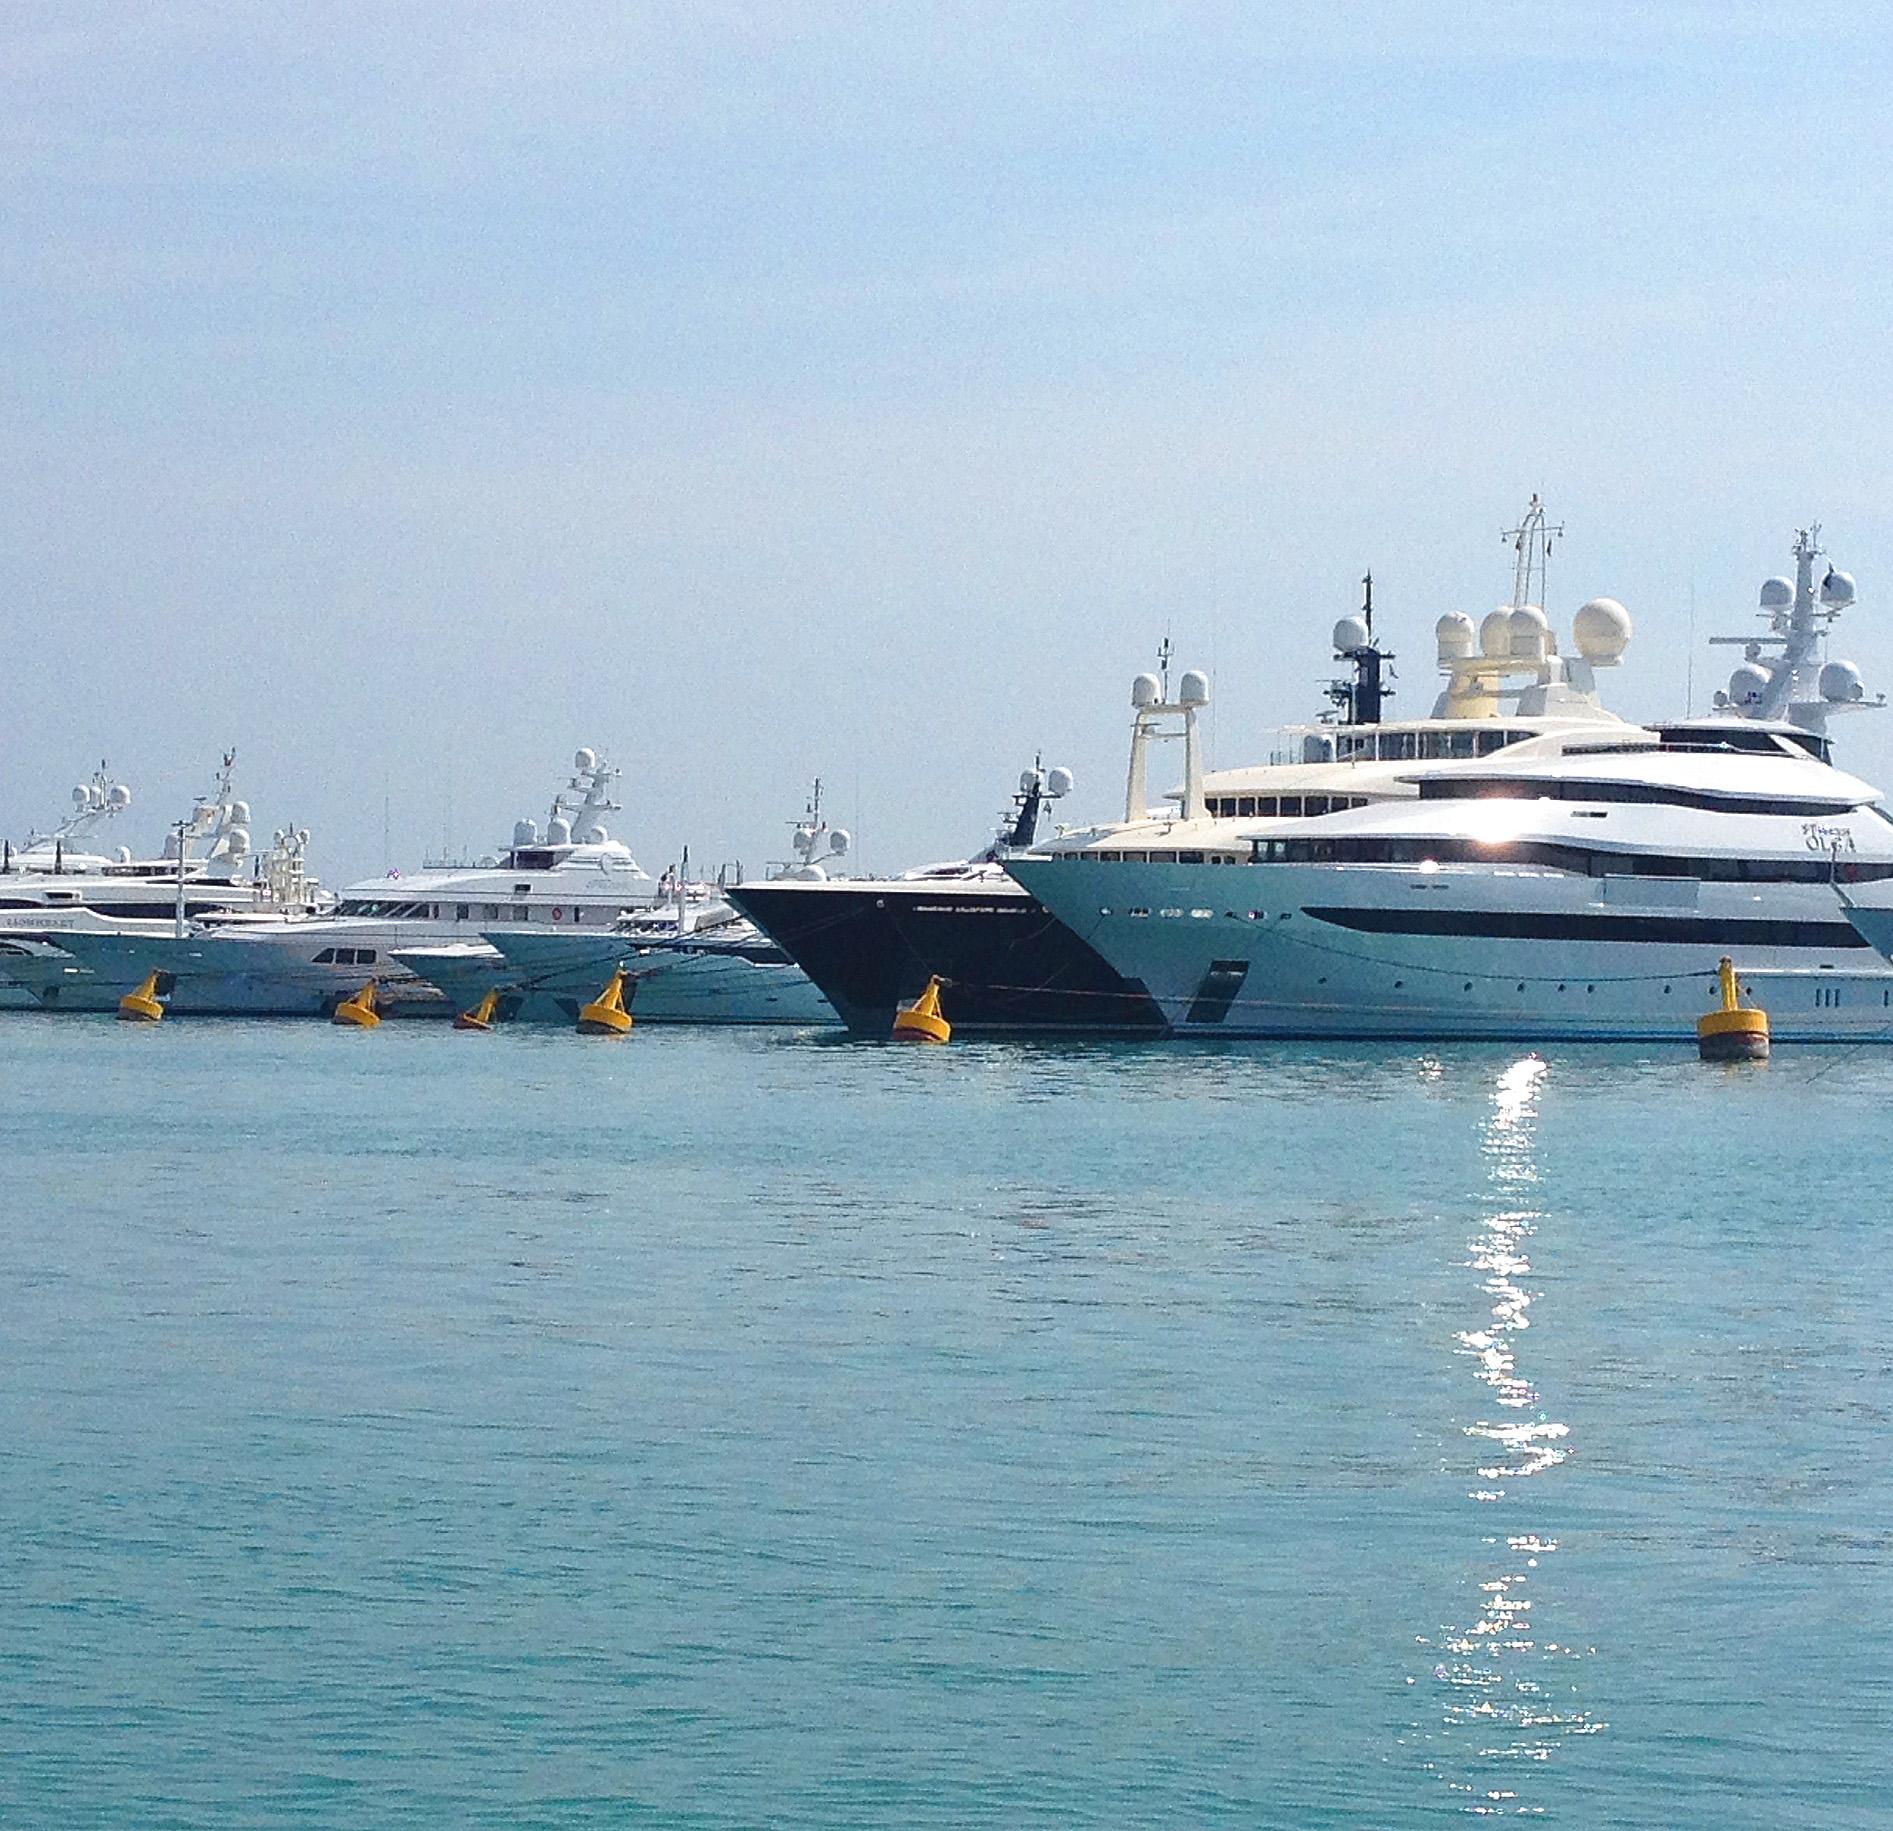 The ASAP- Antibes : Priority to  the Port Vauban's  development